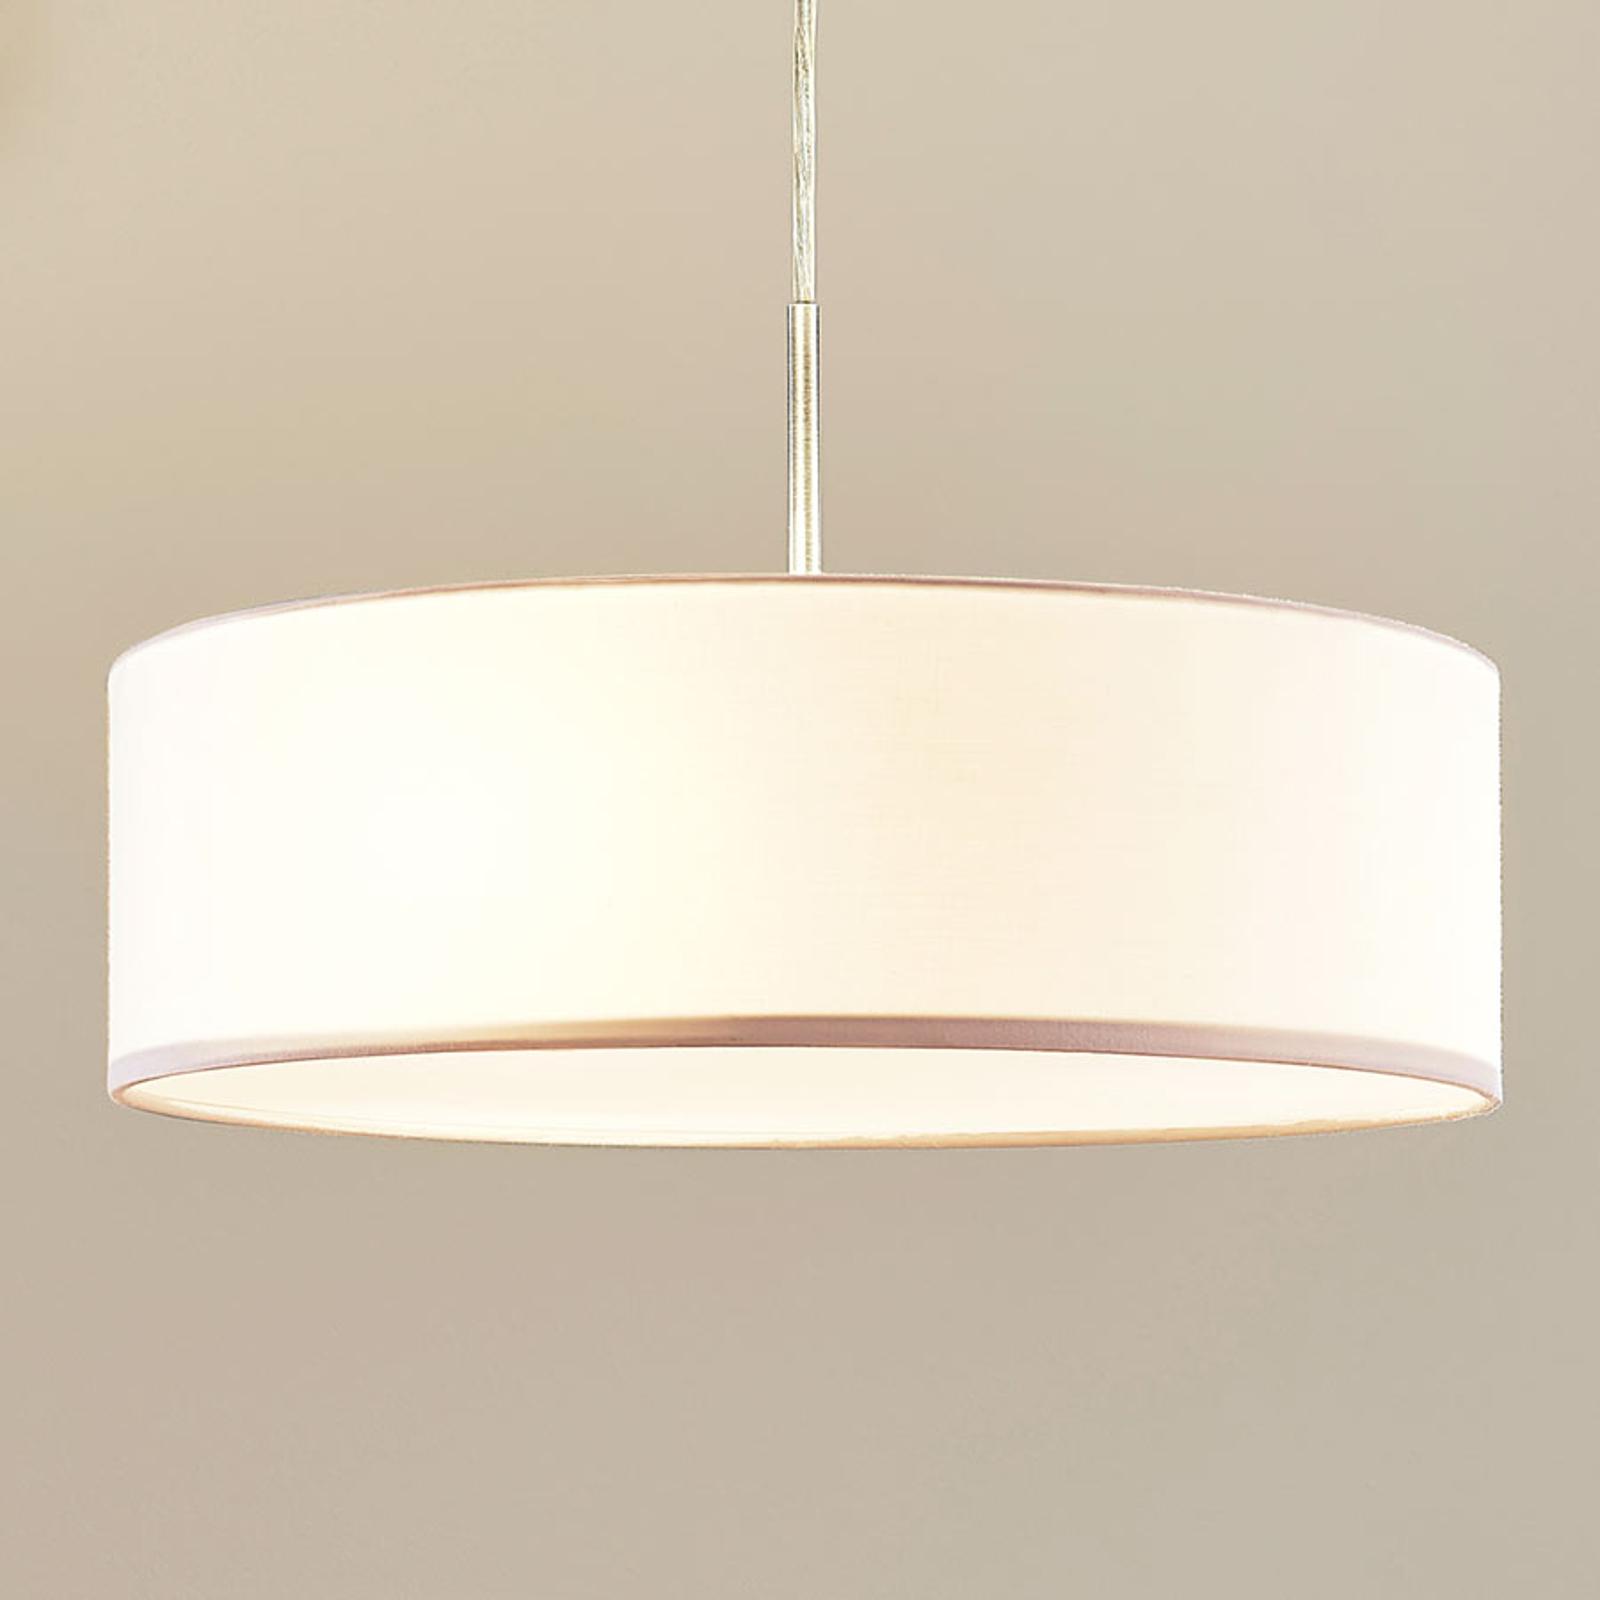 Sebatin - lampada a sospensione, tessuto crema